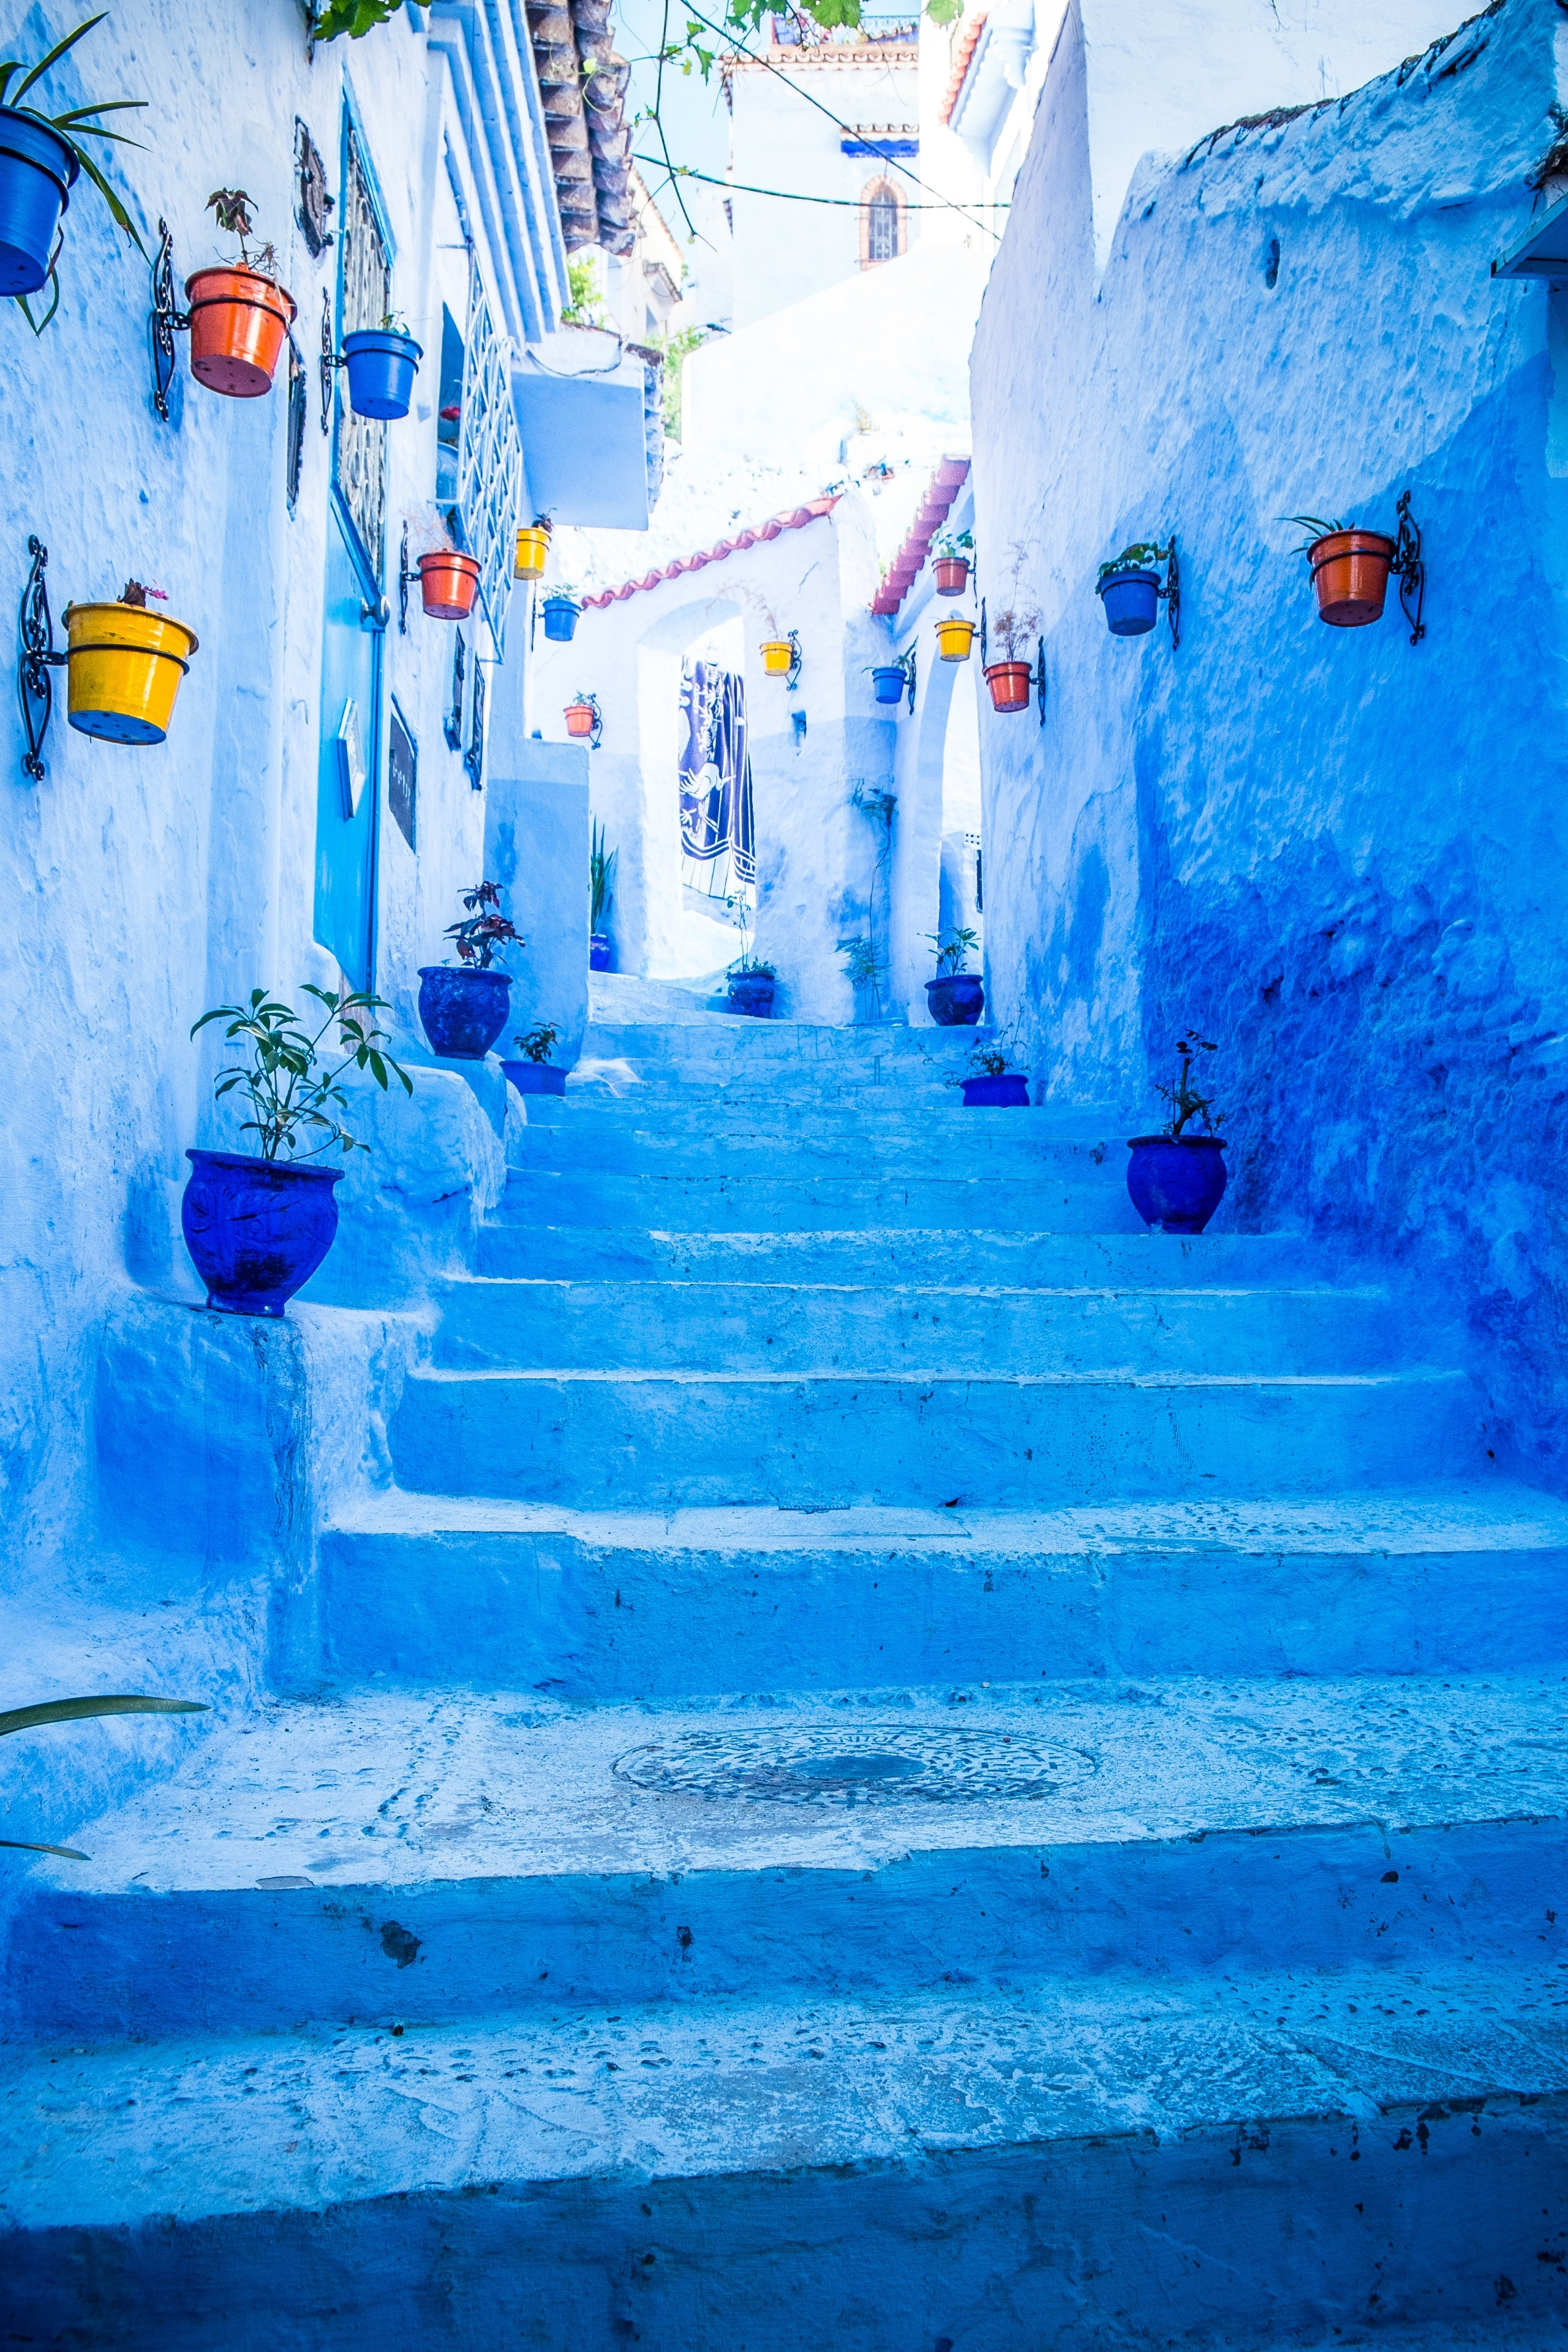 Chefchaouen, Tanger-Tetouan-Al Hoceima, Morocco